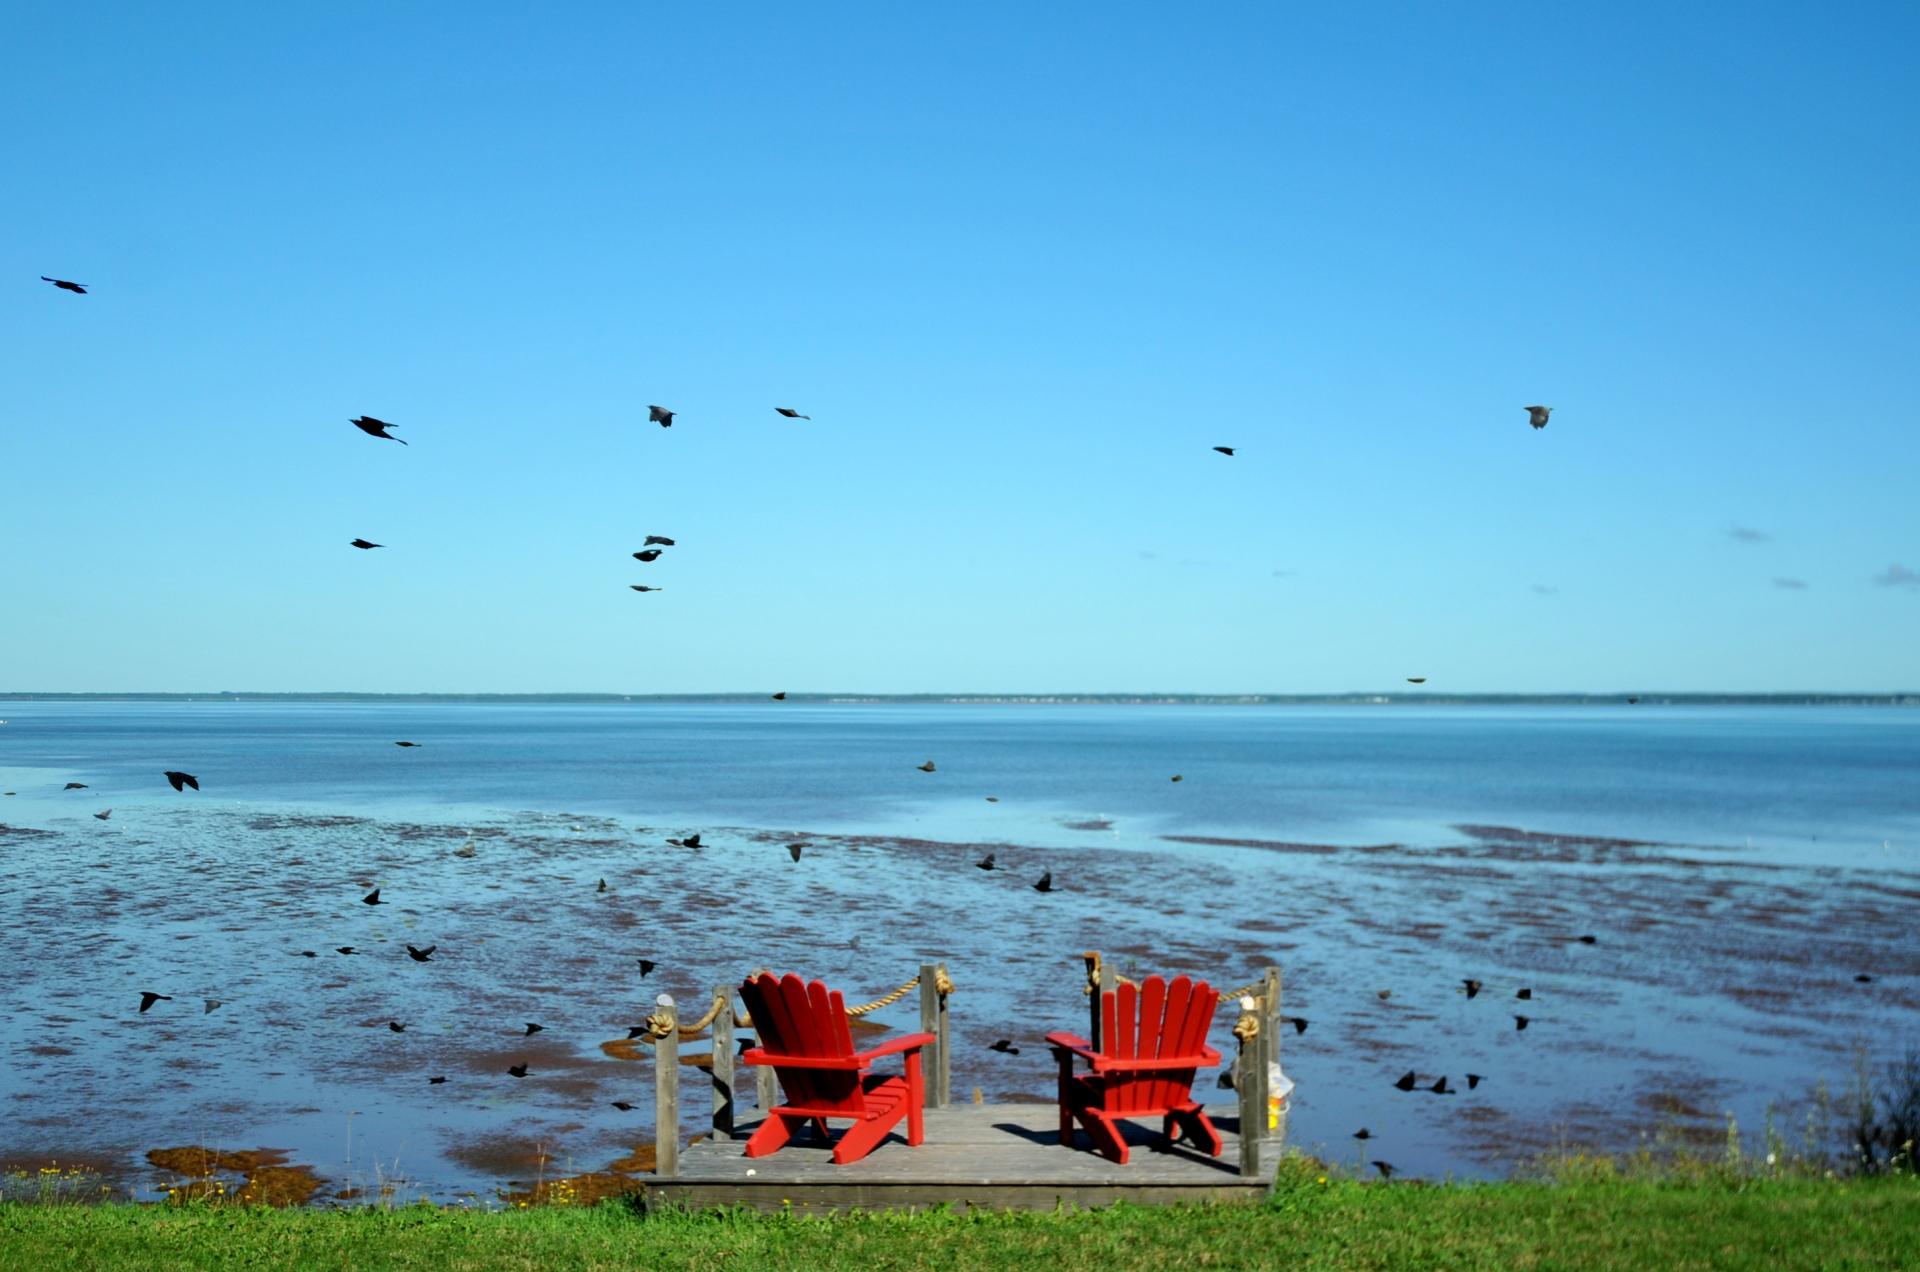 Birds_redchairs